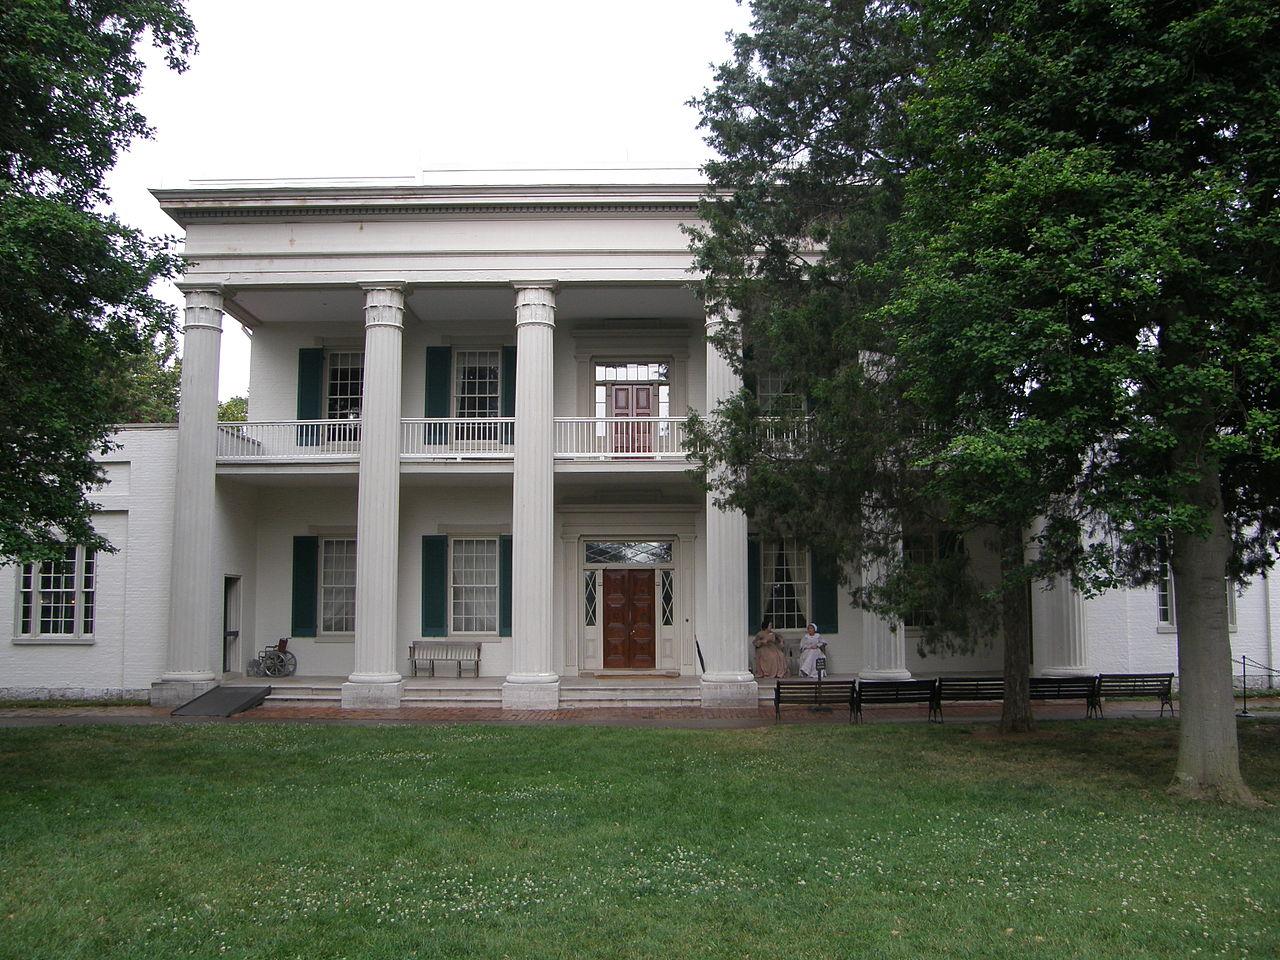 The Hermitage, Nashville, Tennessee (Photo Credit: Wikipedia)